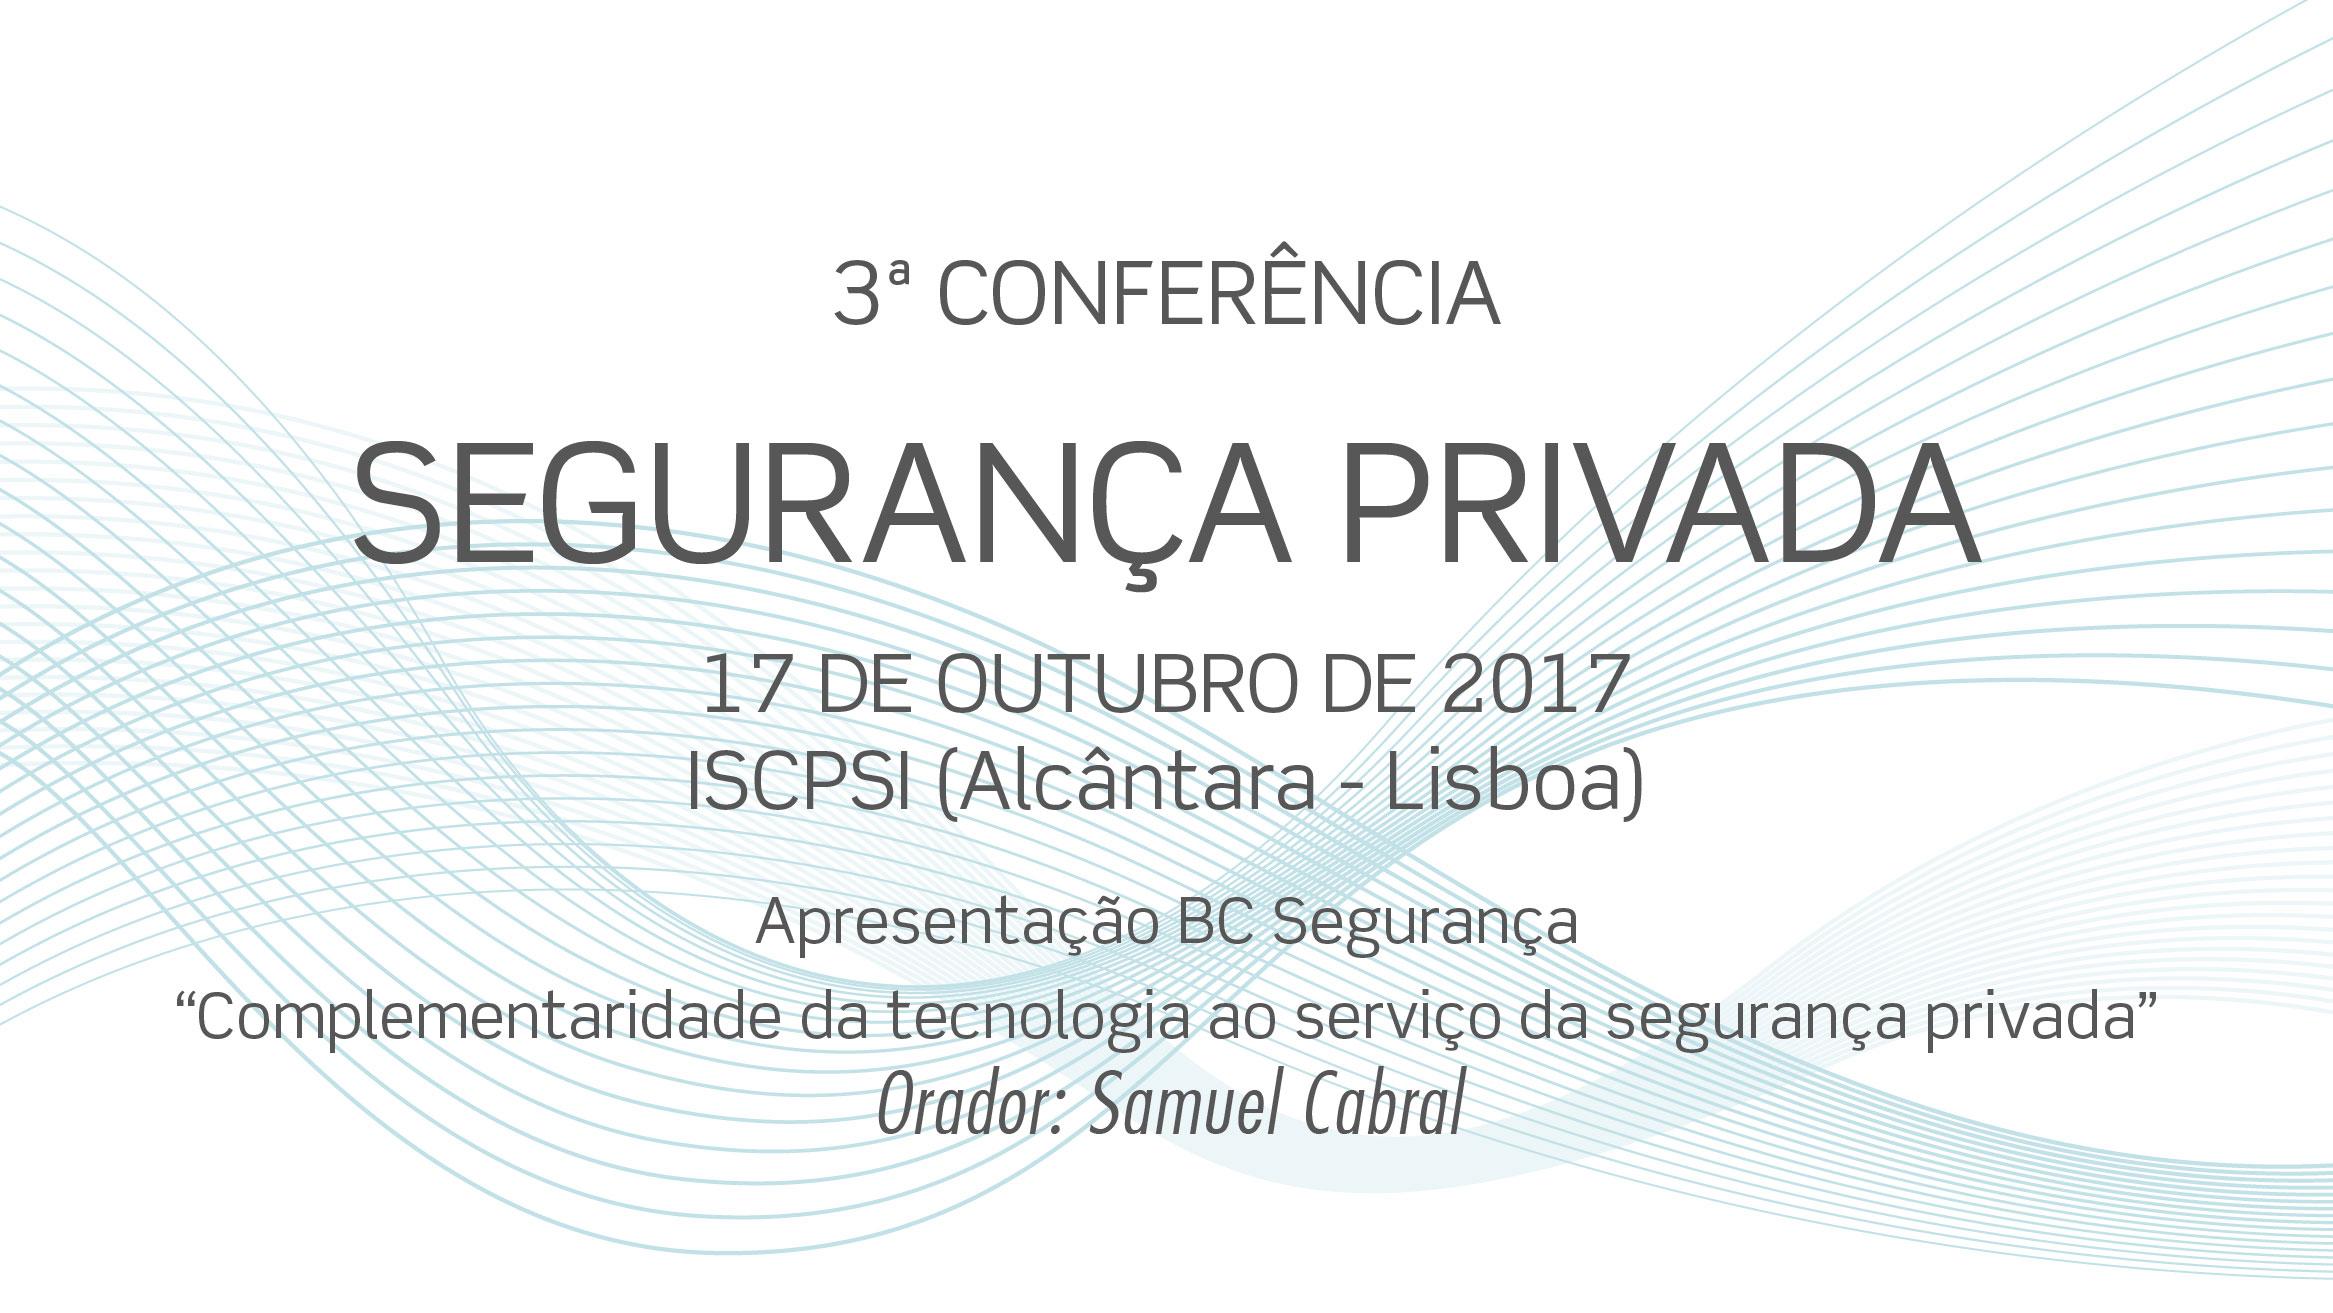 3ª Conferência - Segurança Privada